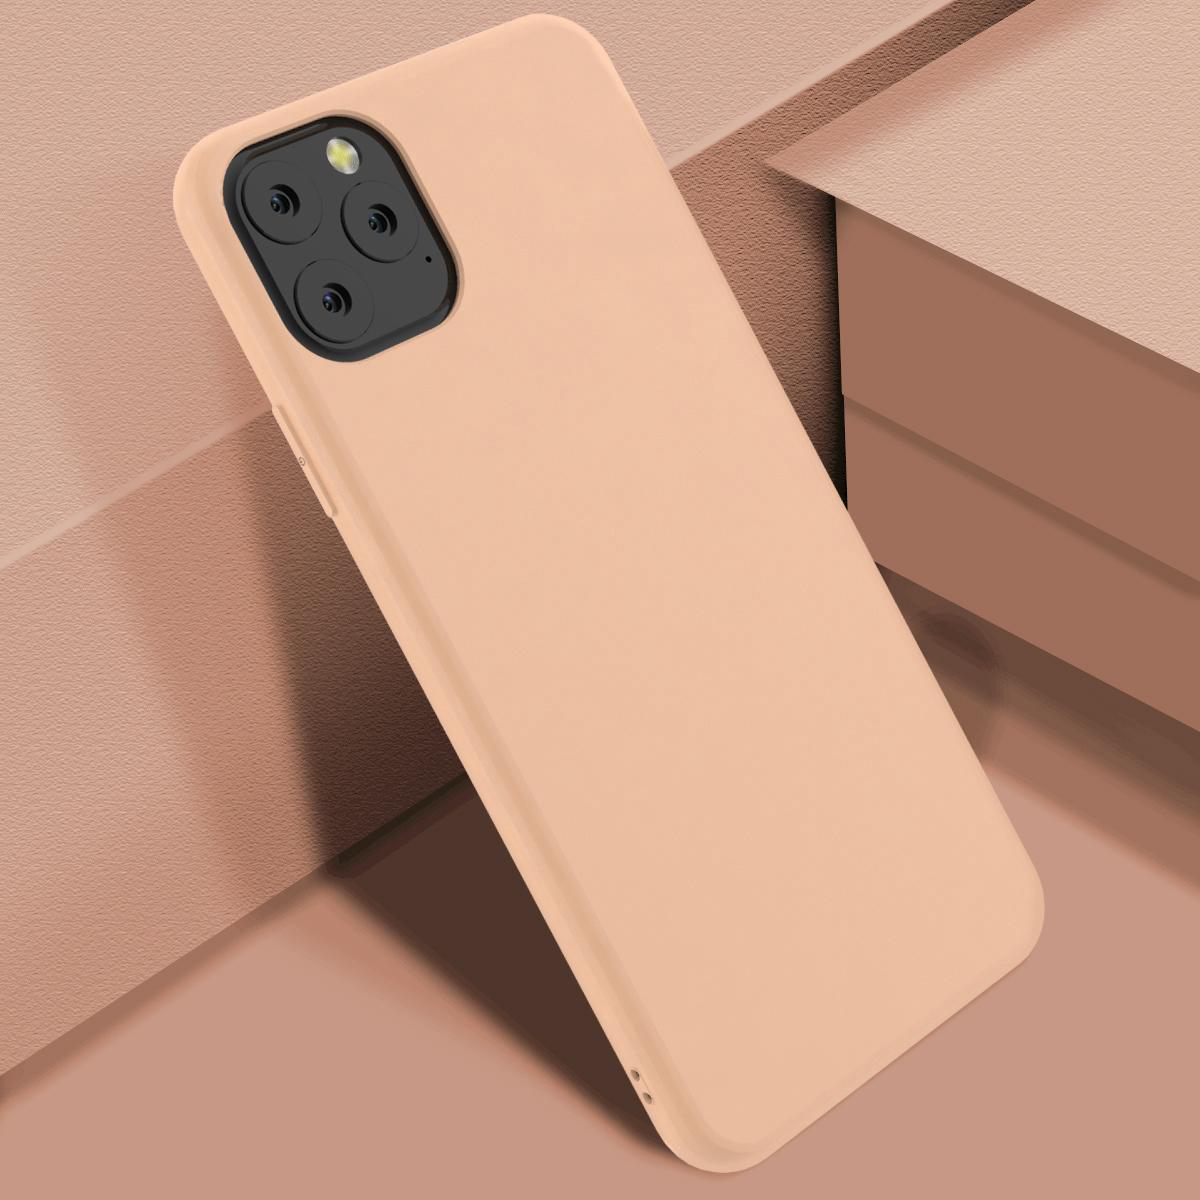 Torubia Silicone Case for iPhone 11/11 Pro/11 Pro Max 106